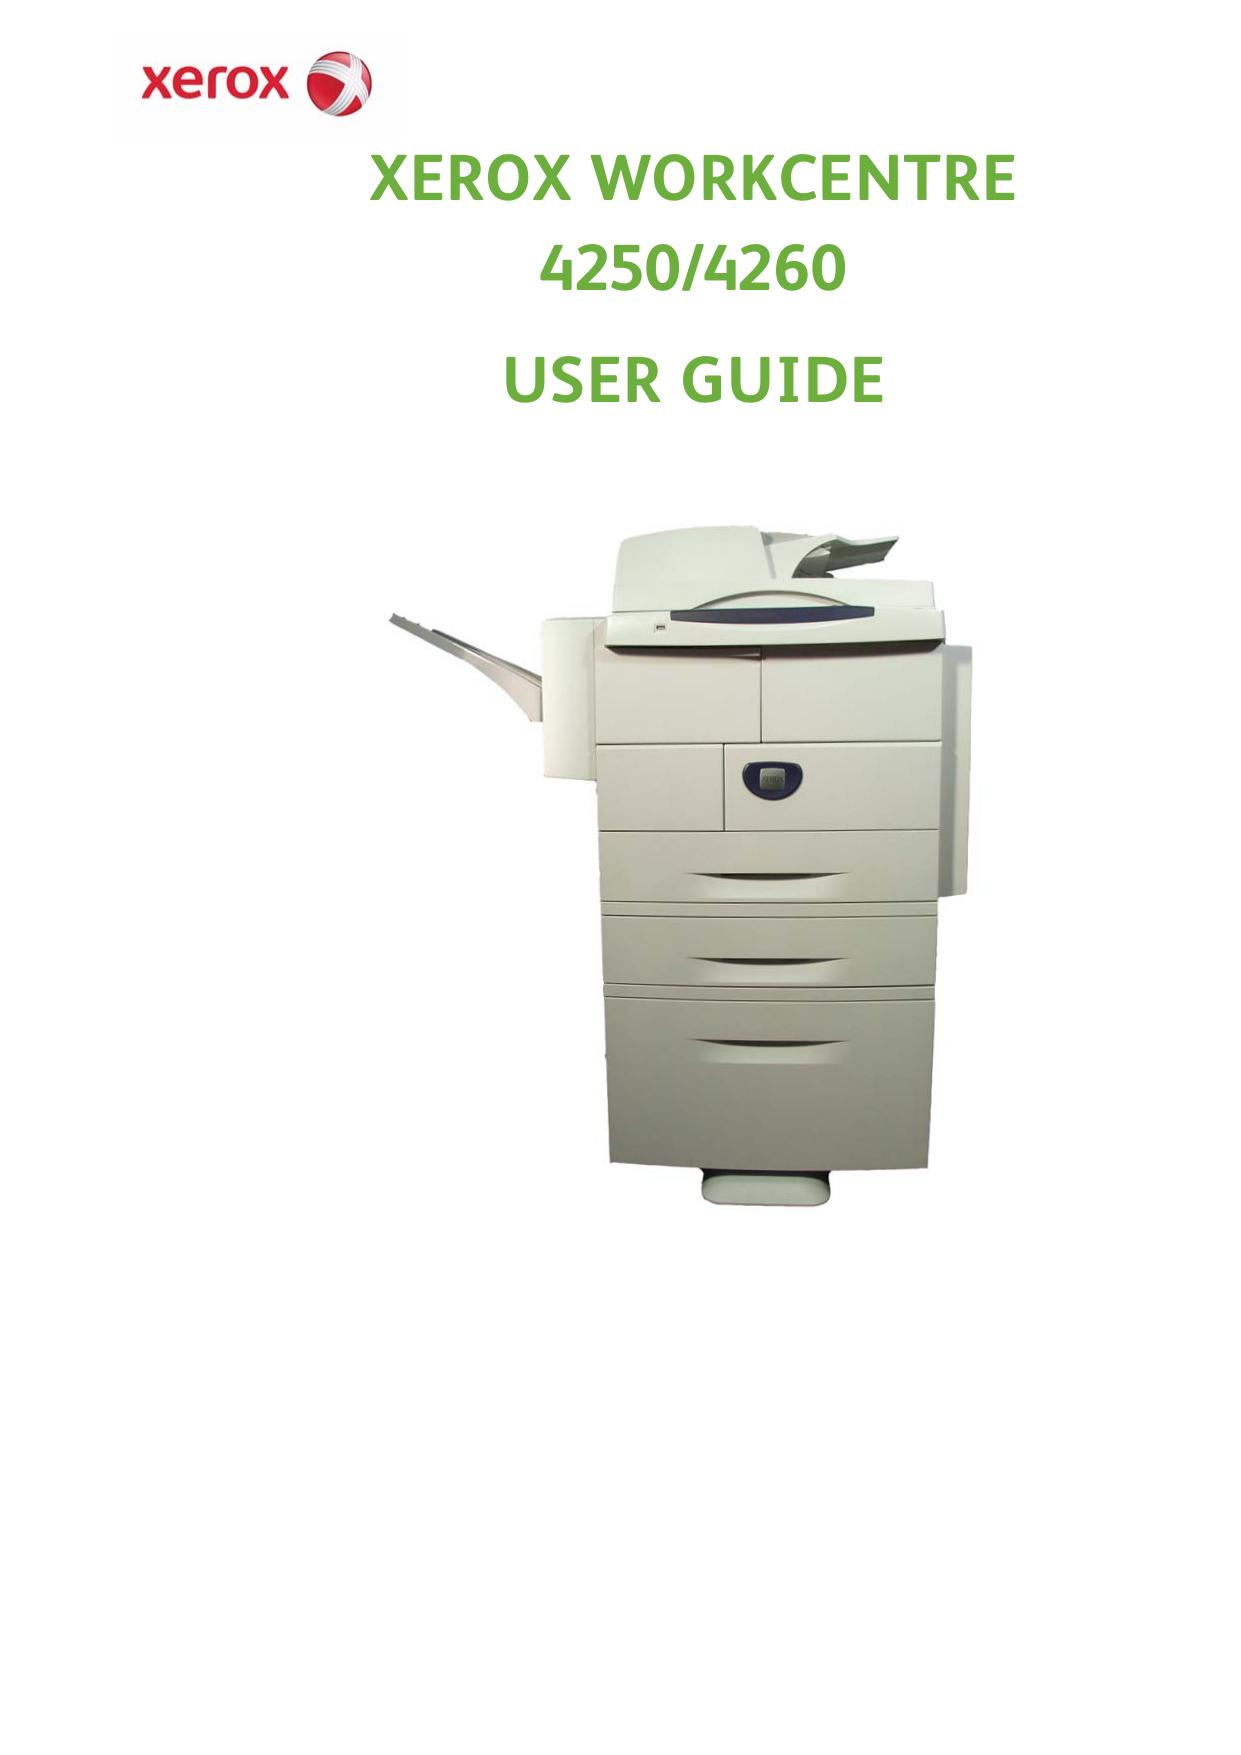 Pdf for xerox multifunction printer workcentre m24 manual